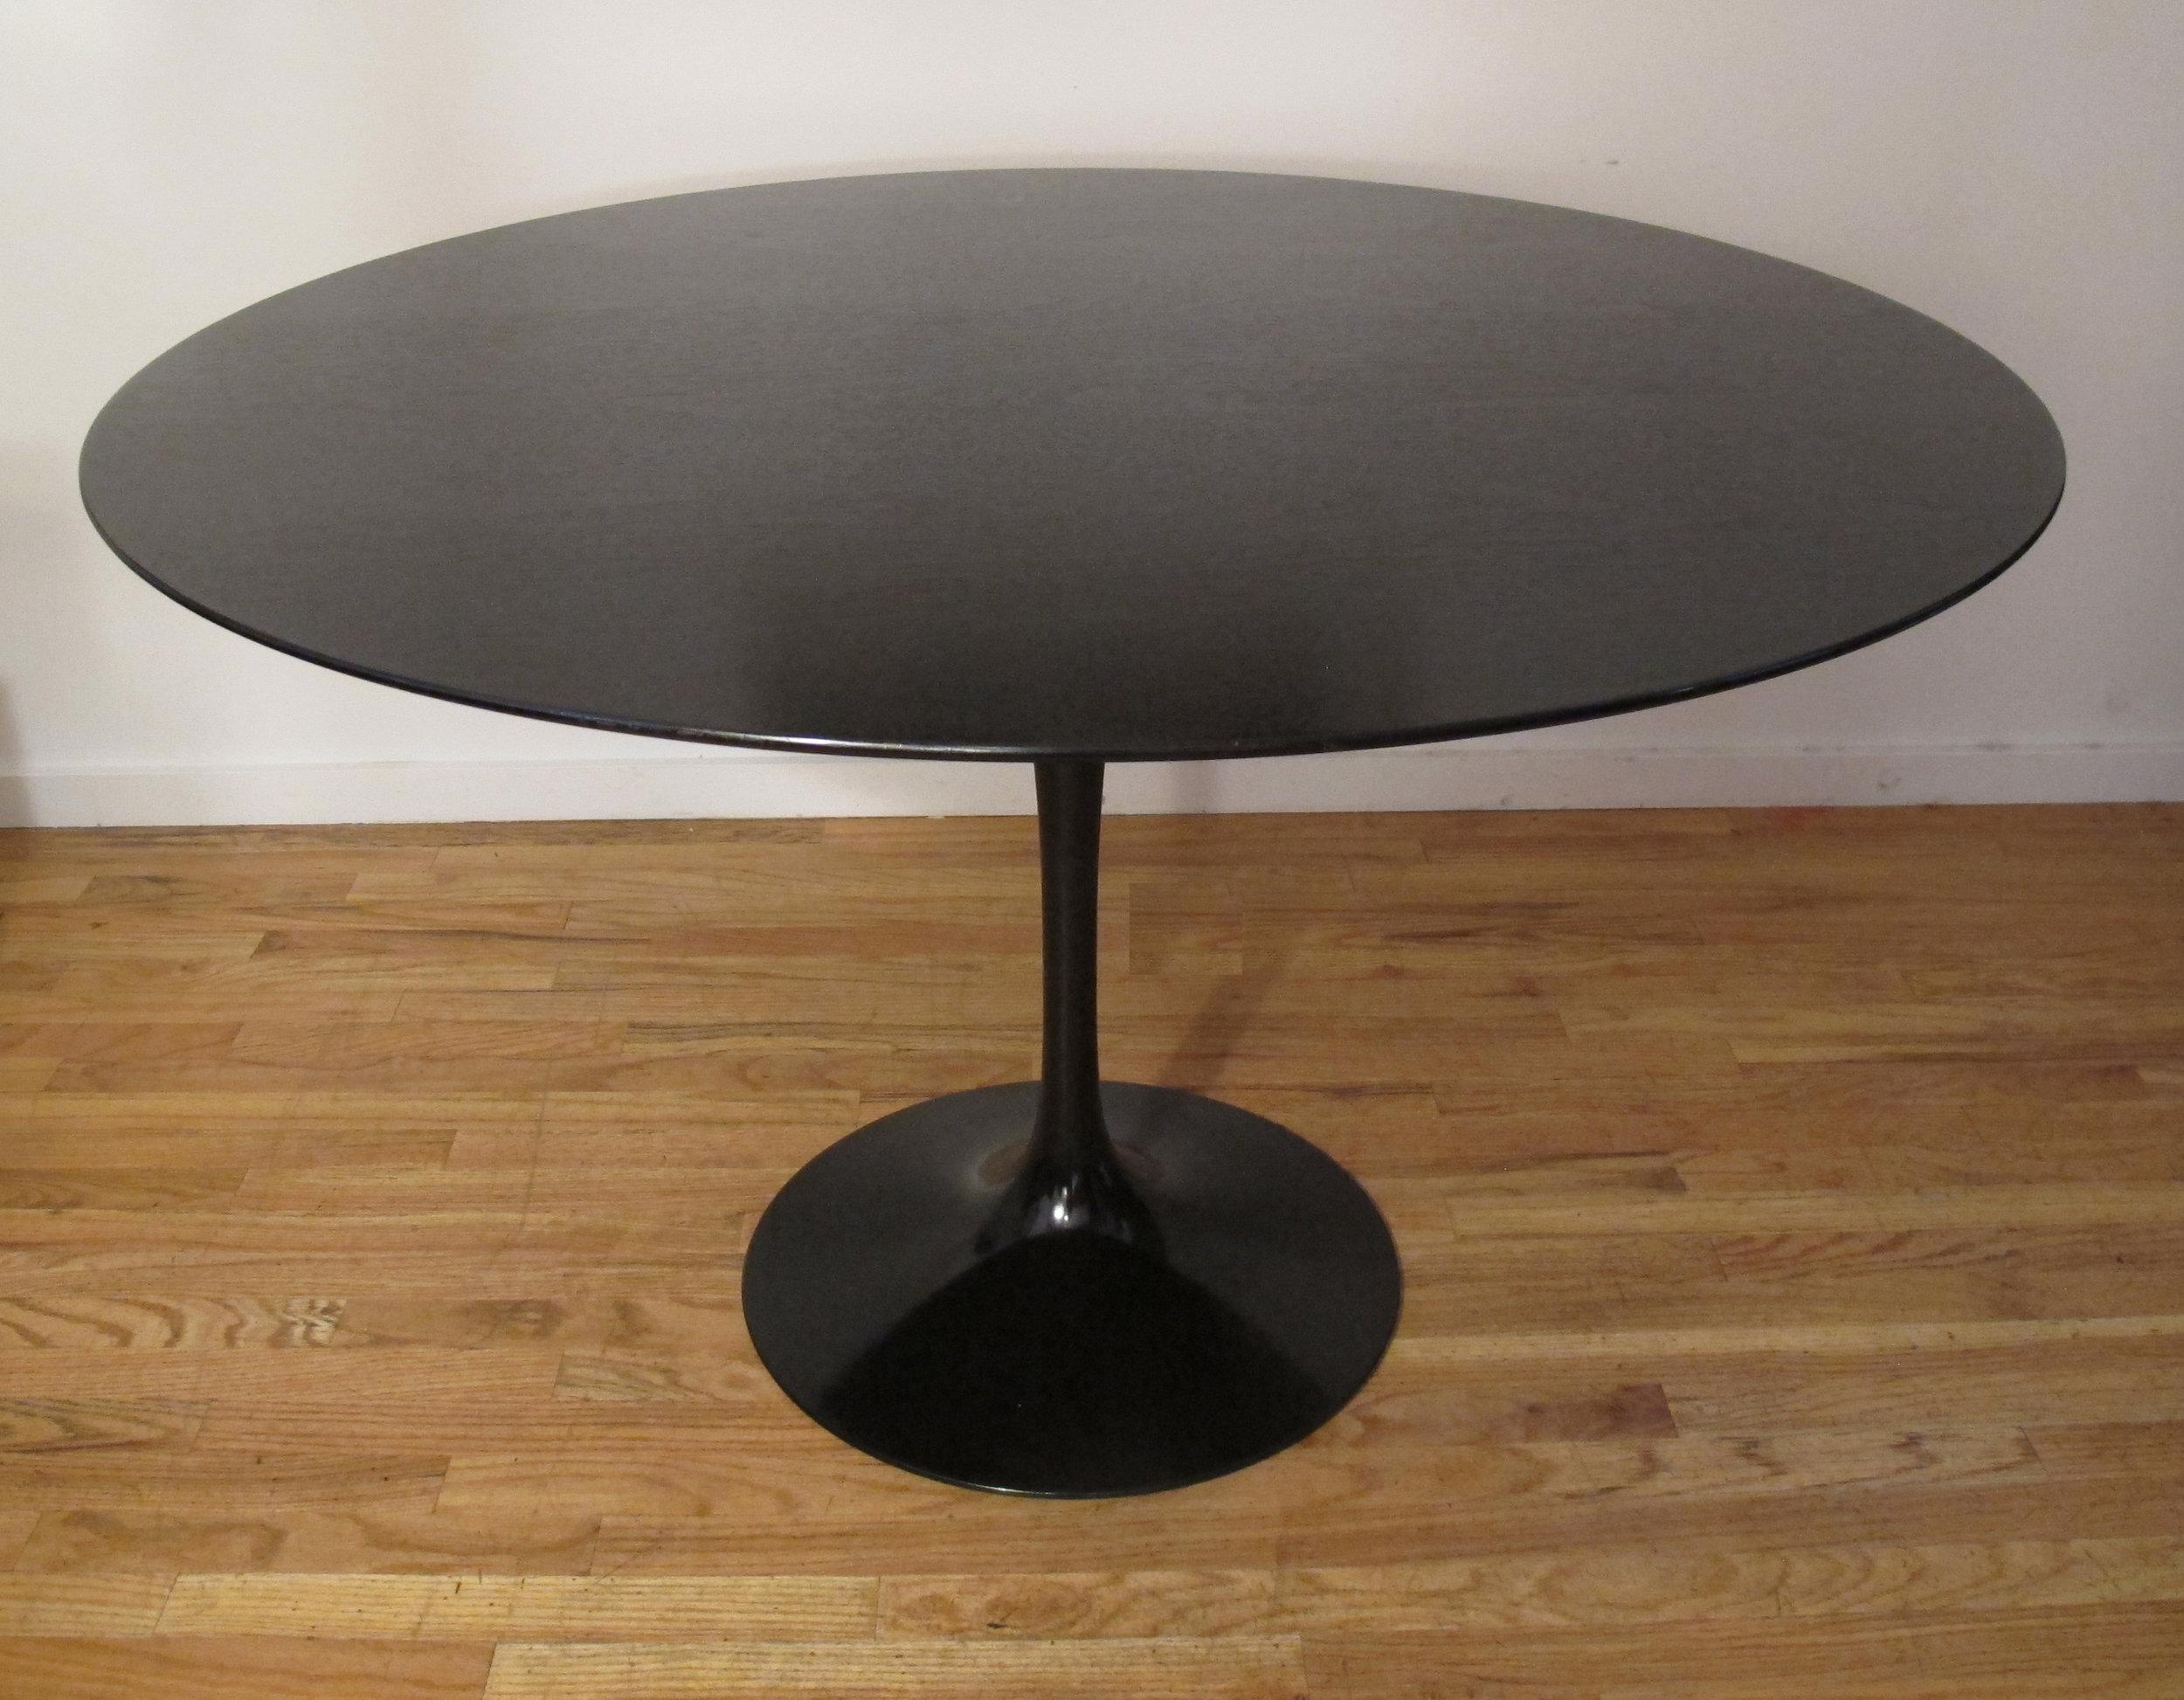 KNOLL SAARINEN EBONIZED WALNUT DINING TABLE